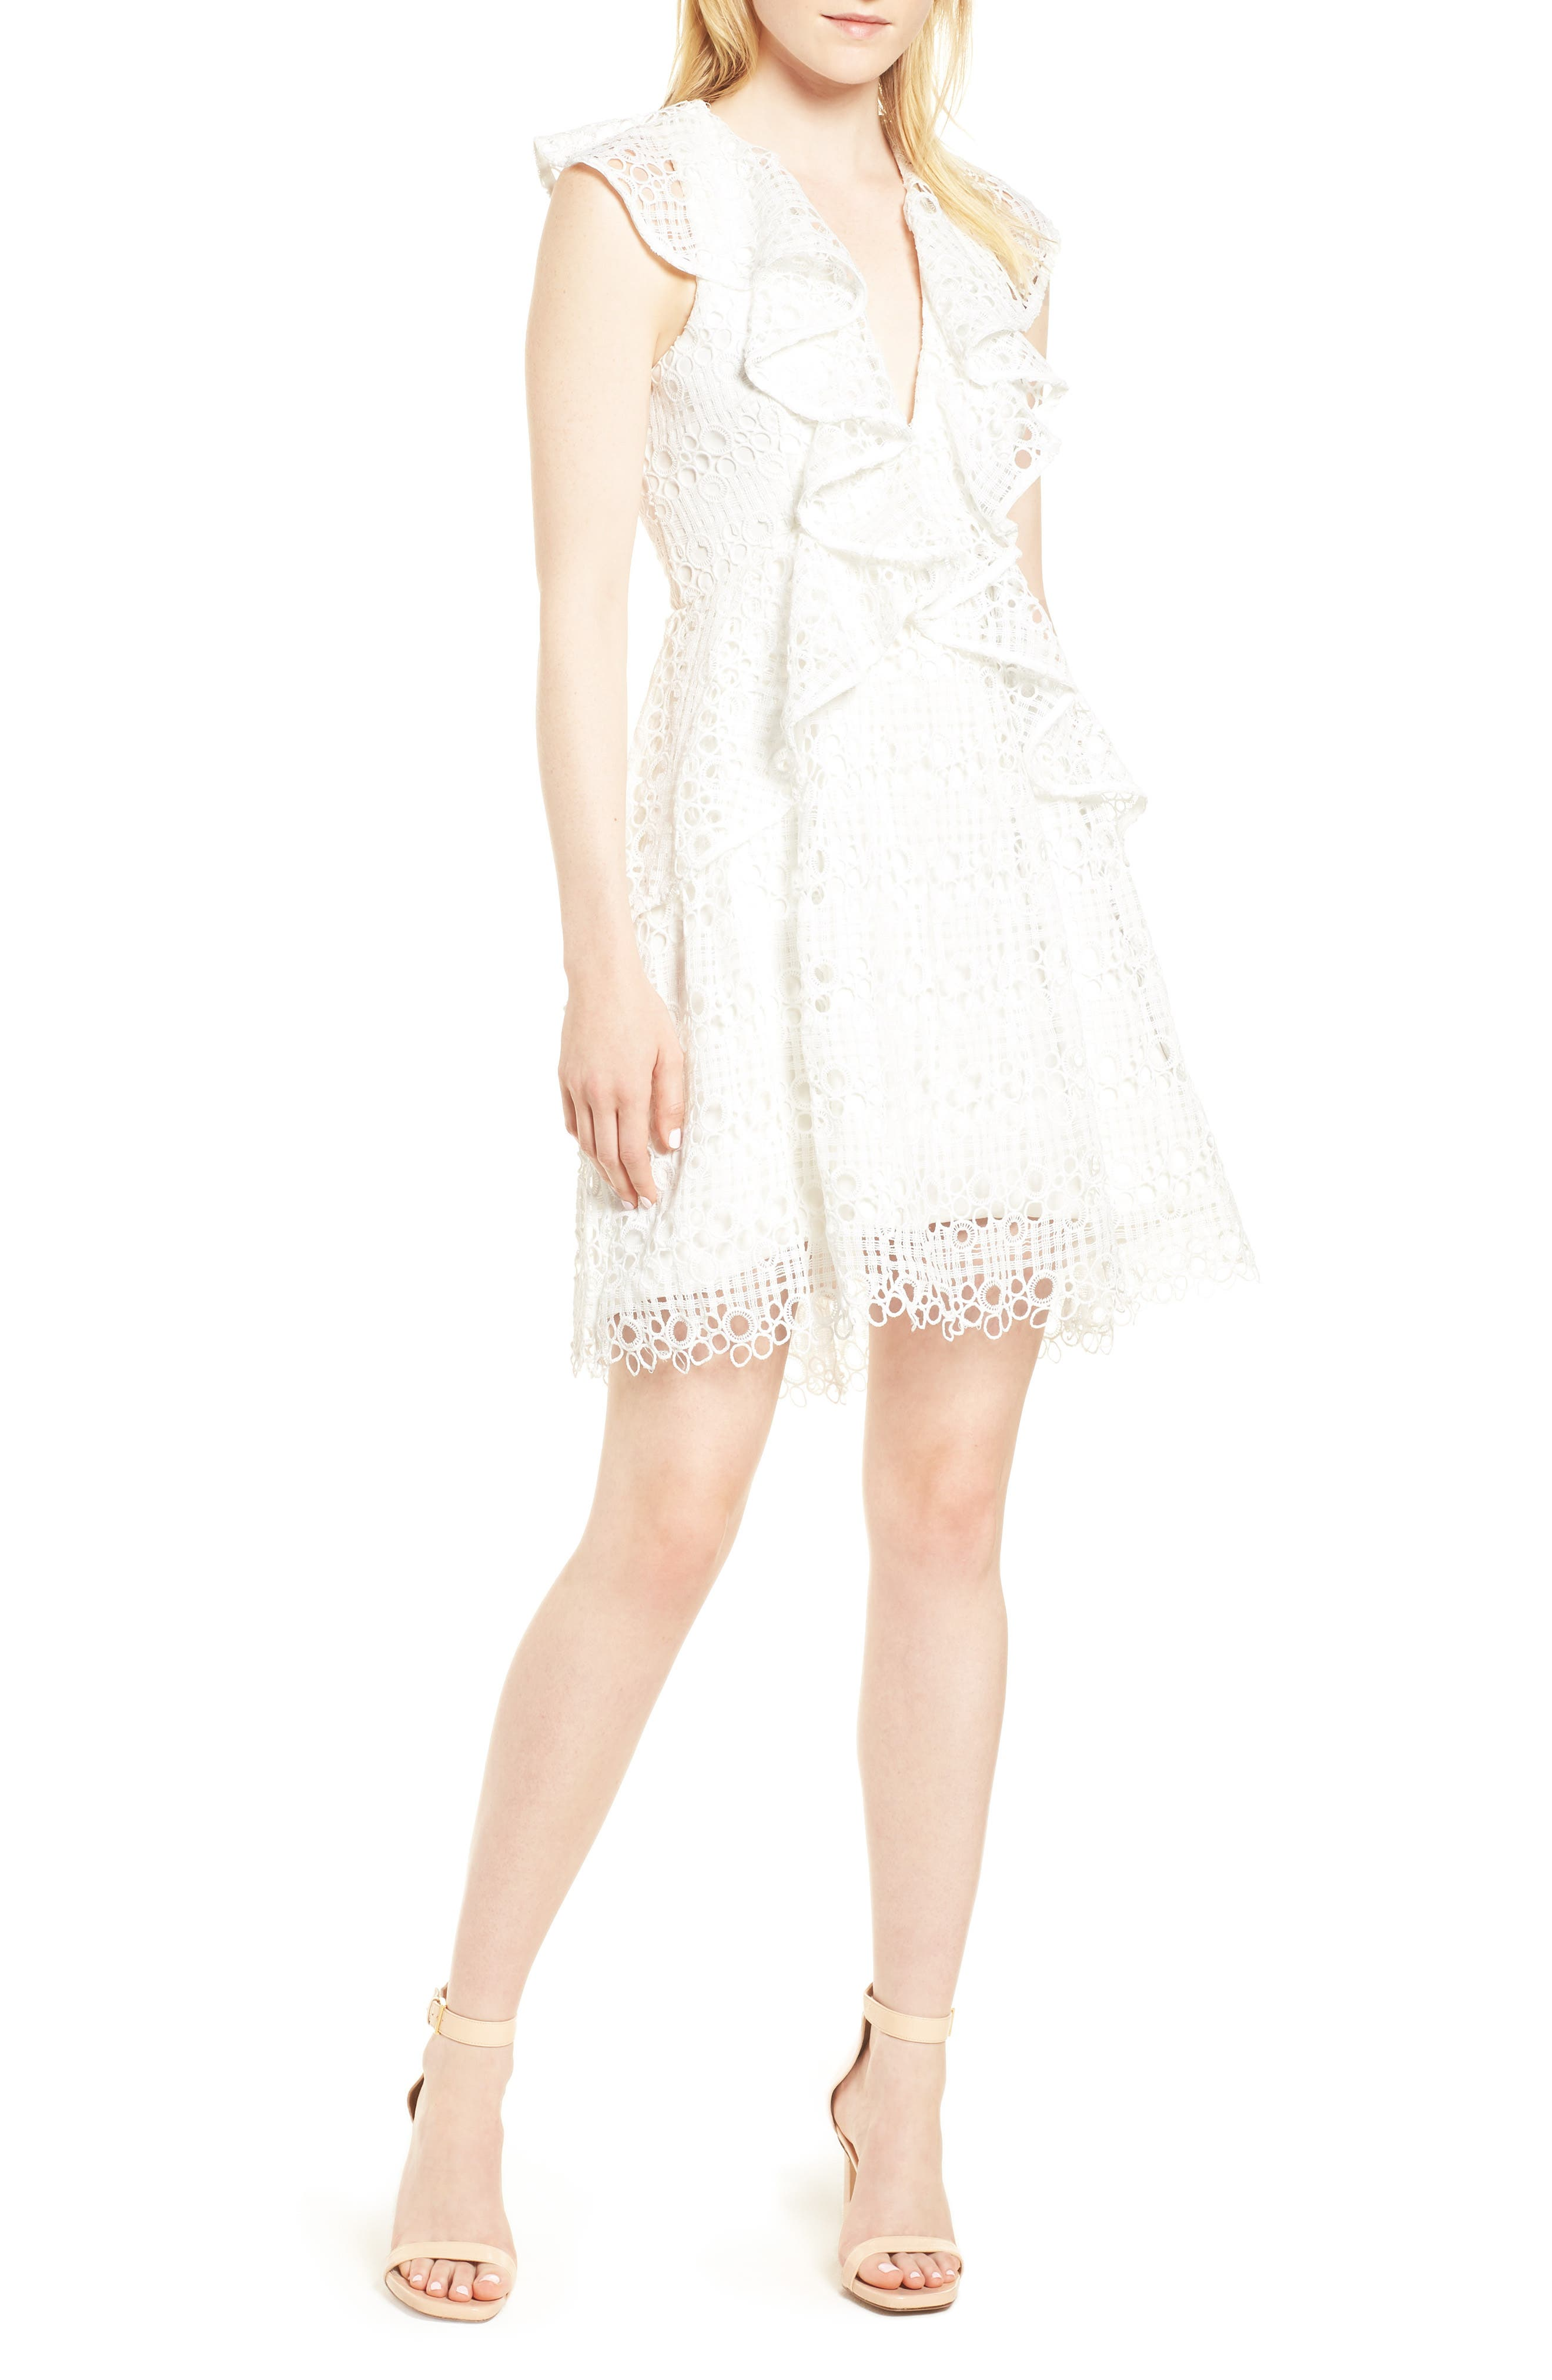 Interlude Dress,                         Main,                         color, 100